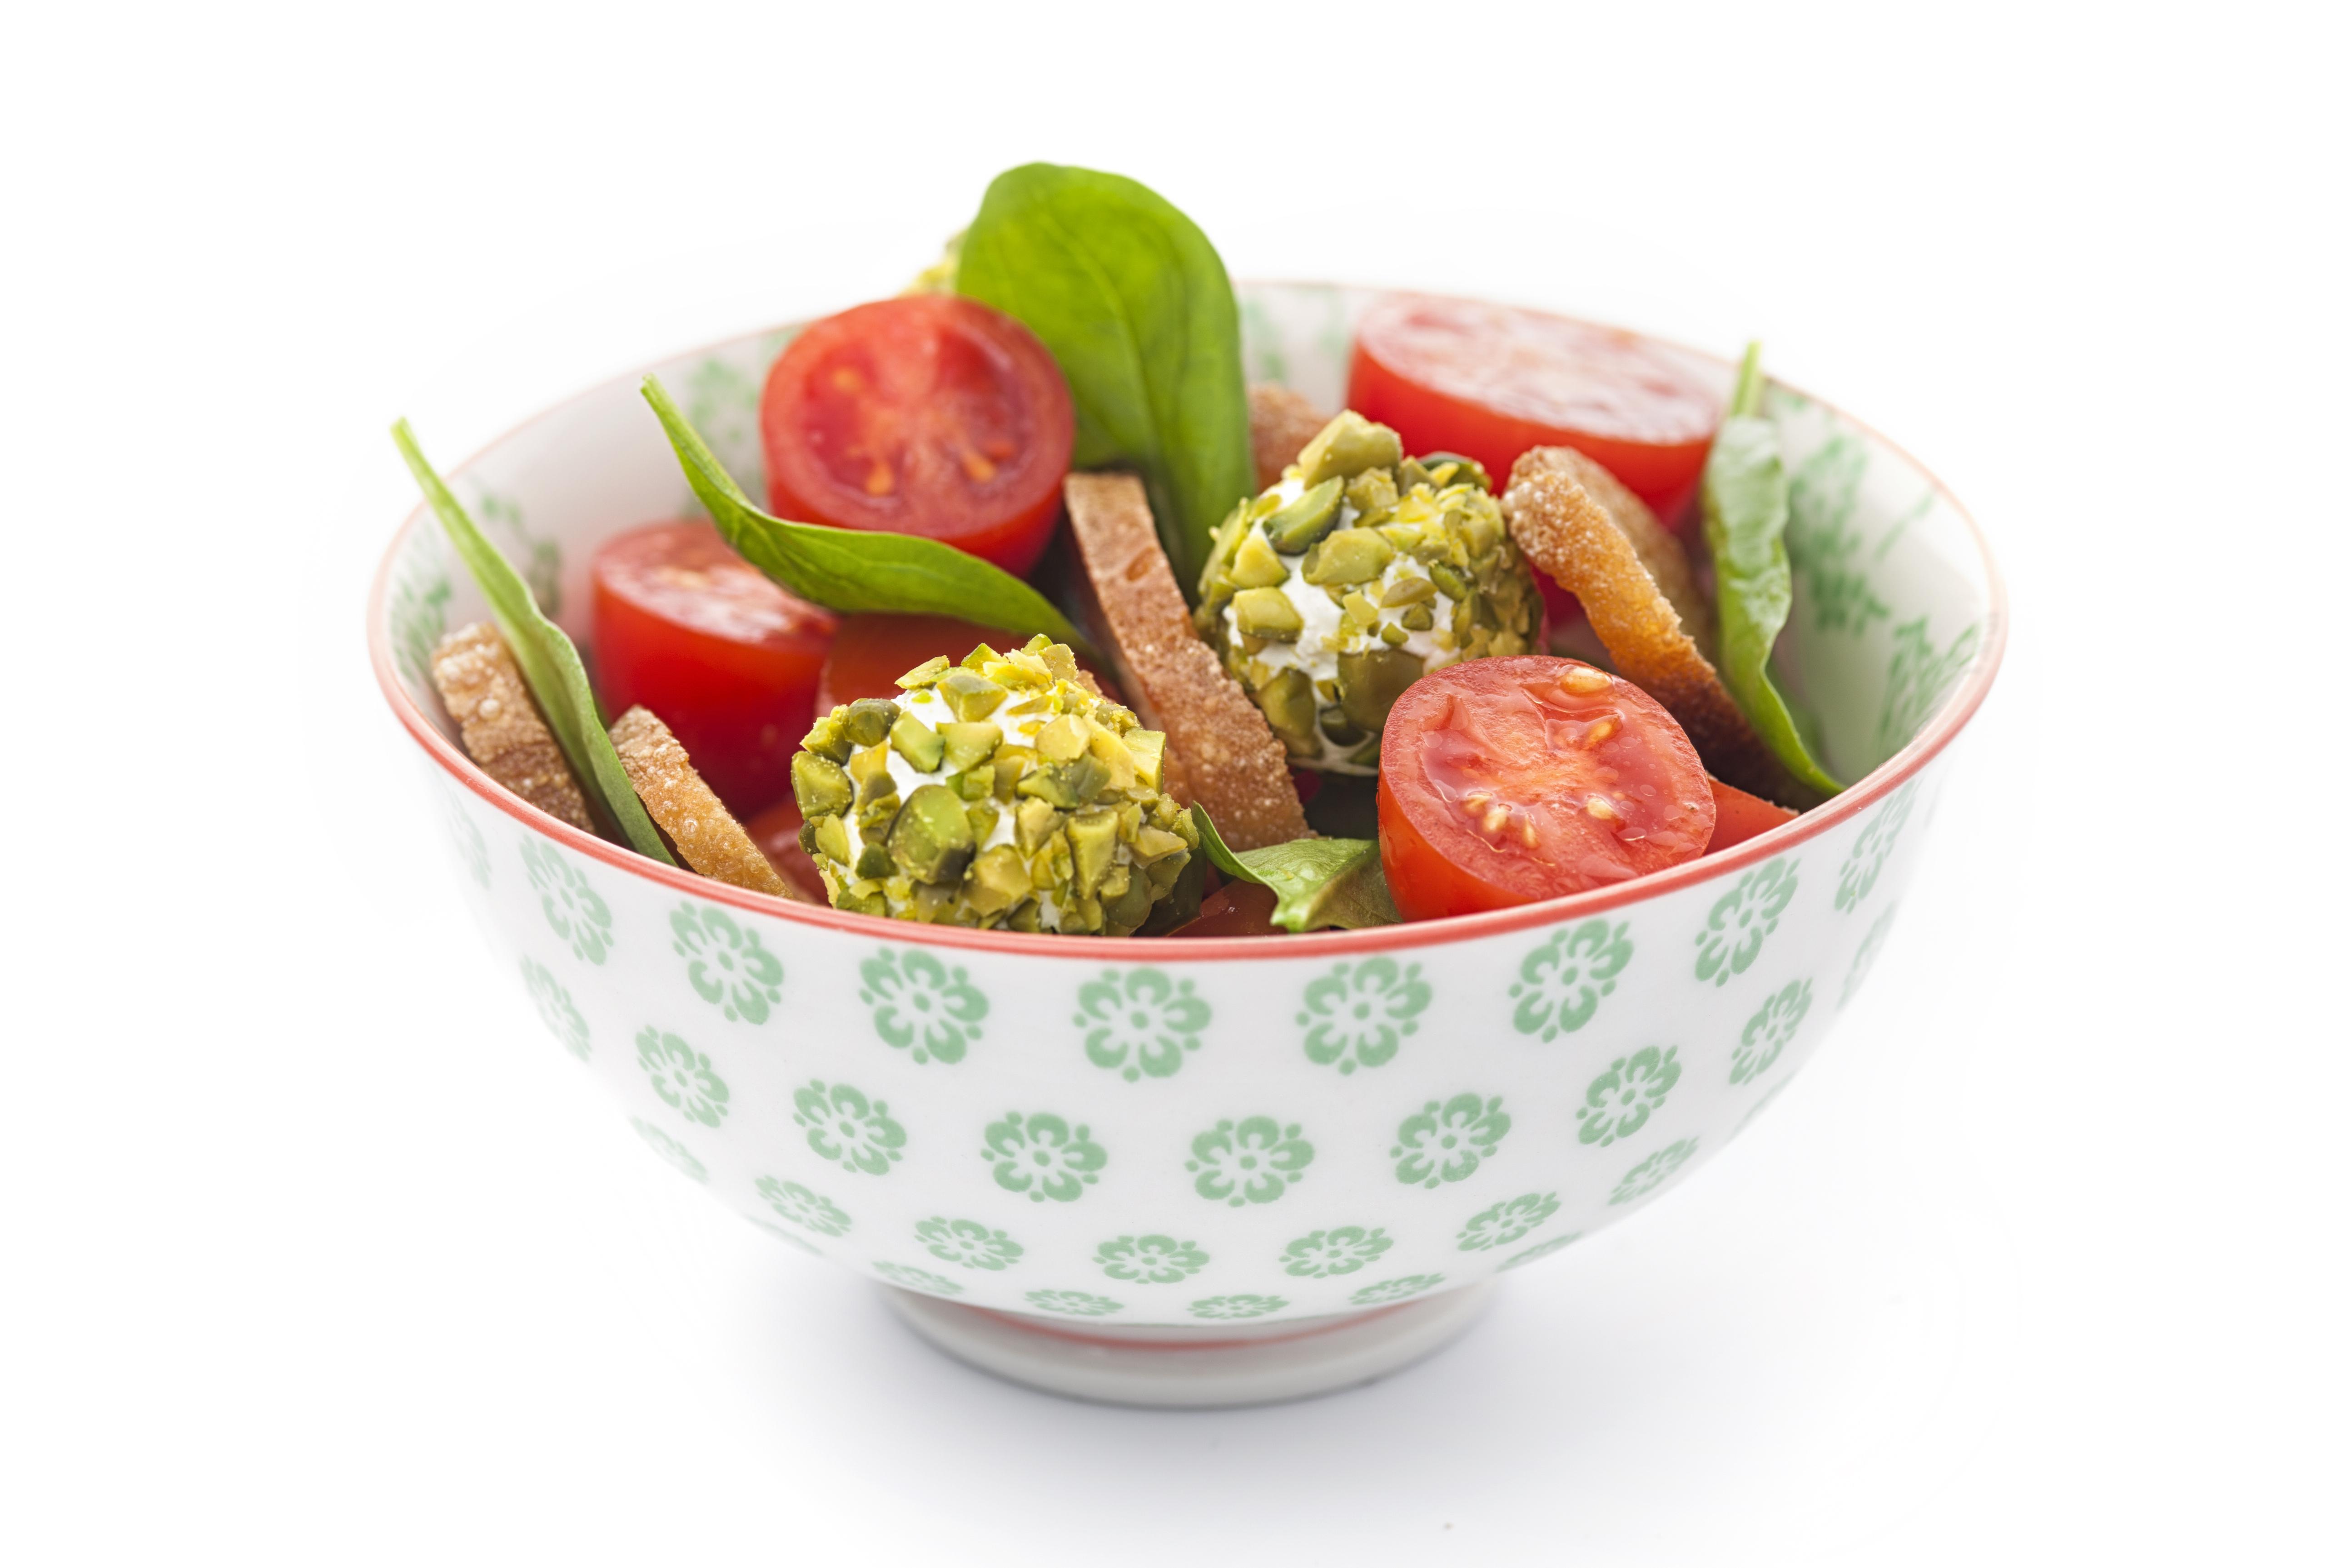 tomaten brot salat mit pistazienkugeln lifestyle by v zug ag. Black Bedroom Furniture Sets. Home Design Ideas